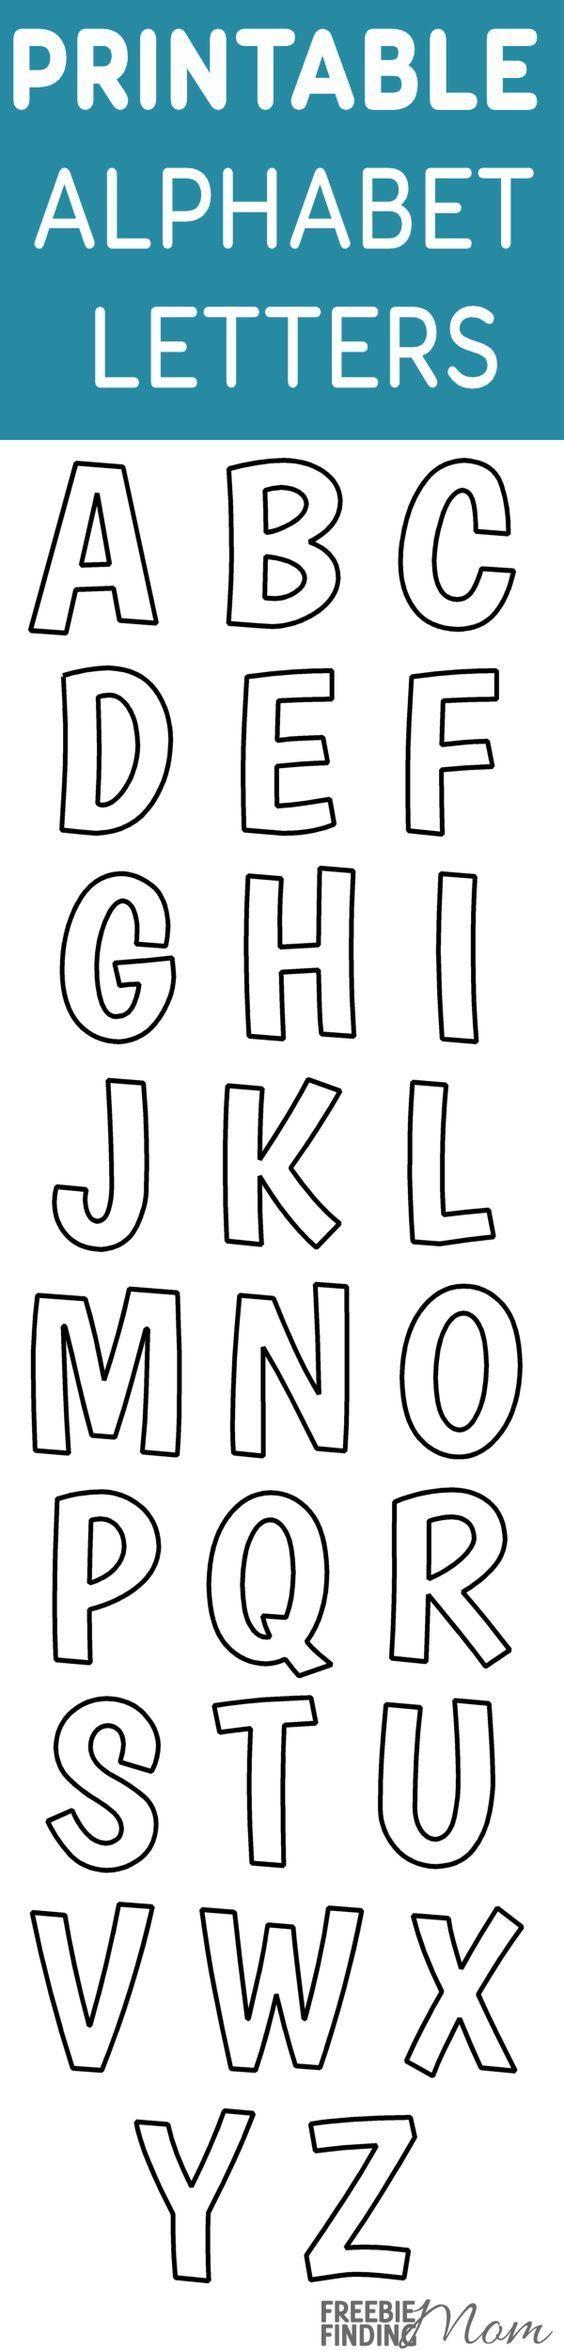 Printable free alphabet templates painting ideas pinterest printable free alphabet templates painting ideas pinterest alphabet templates free printables and homeschool spiritdancerdesigns Gallery